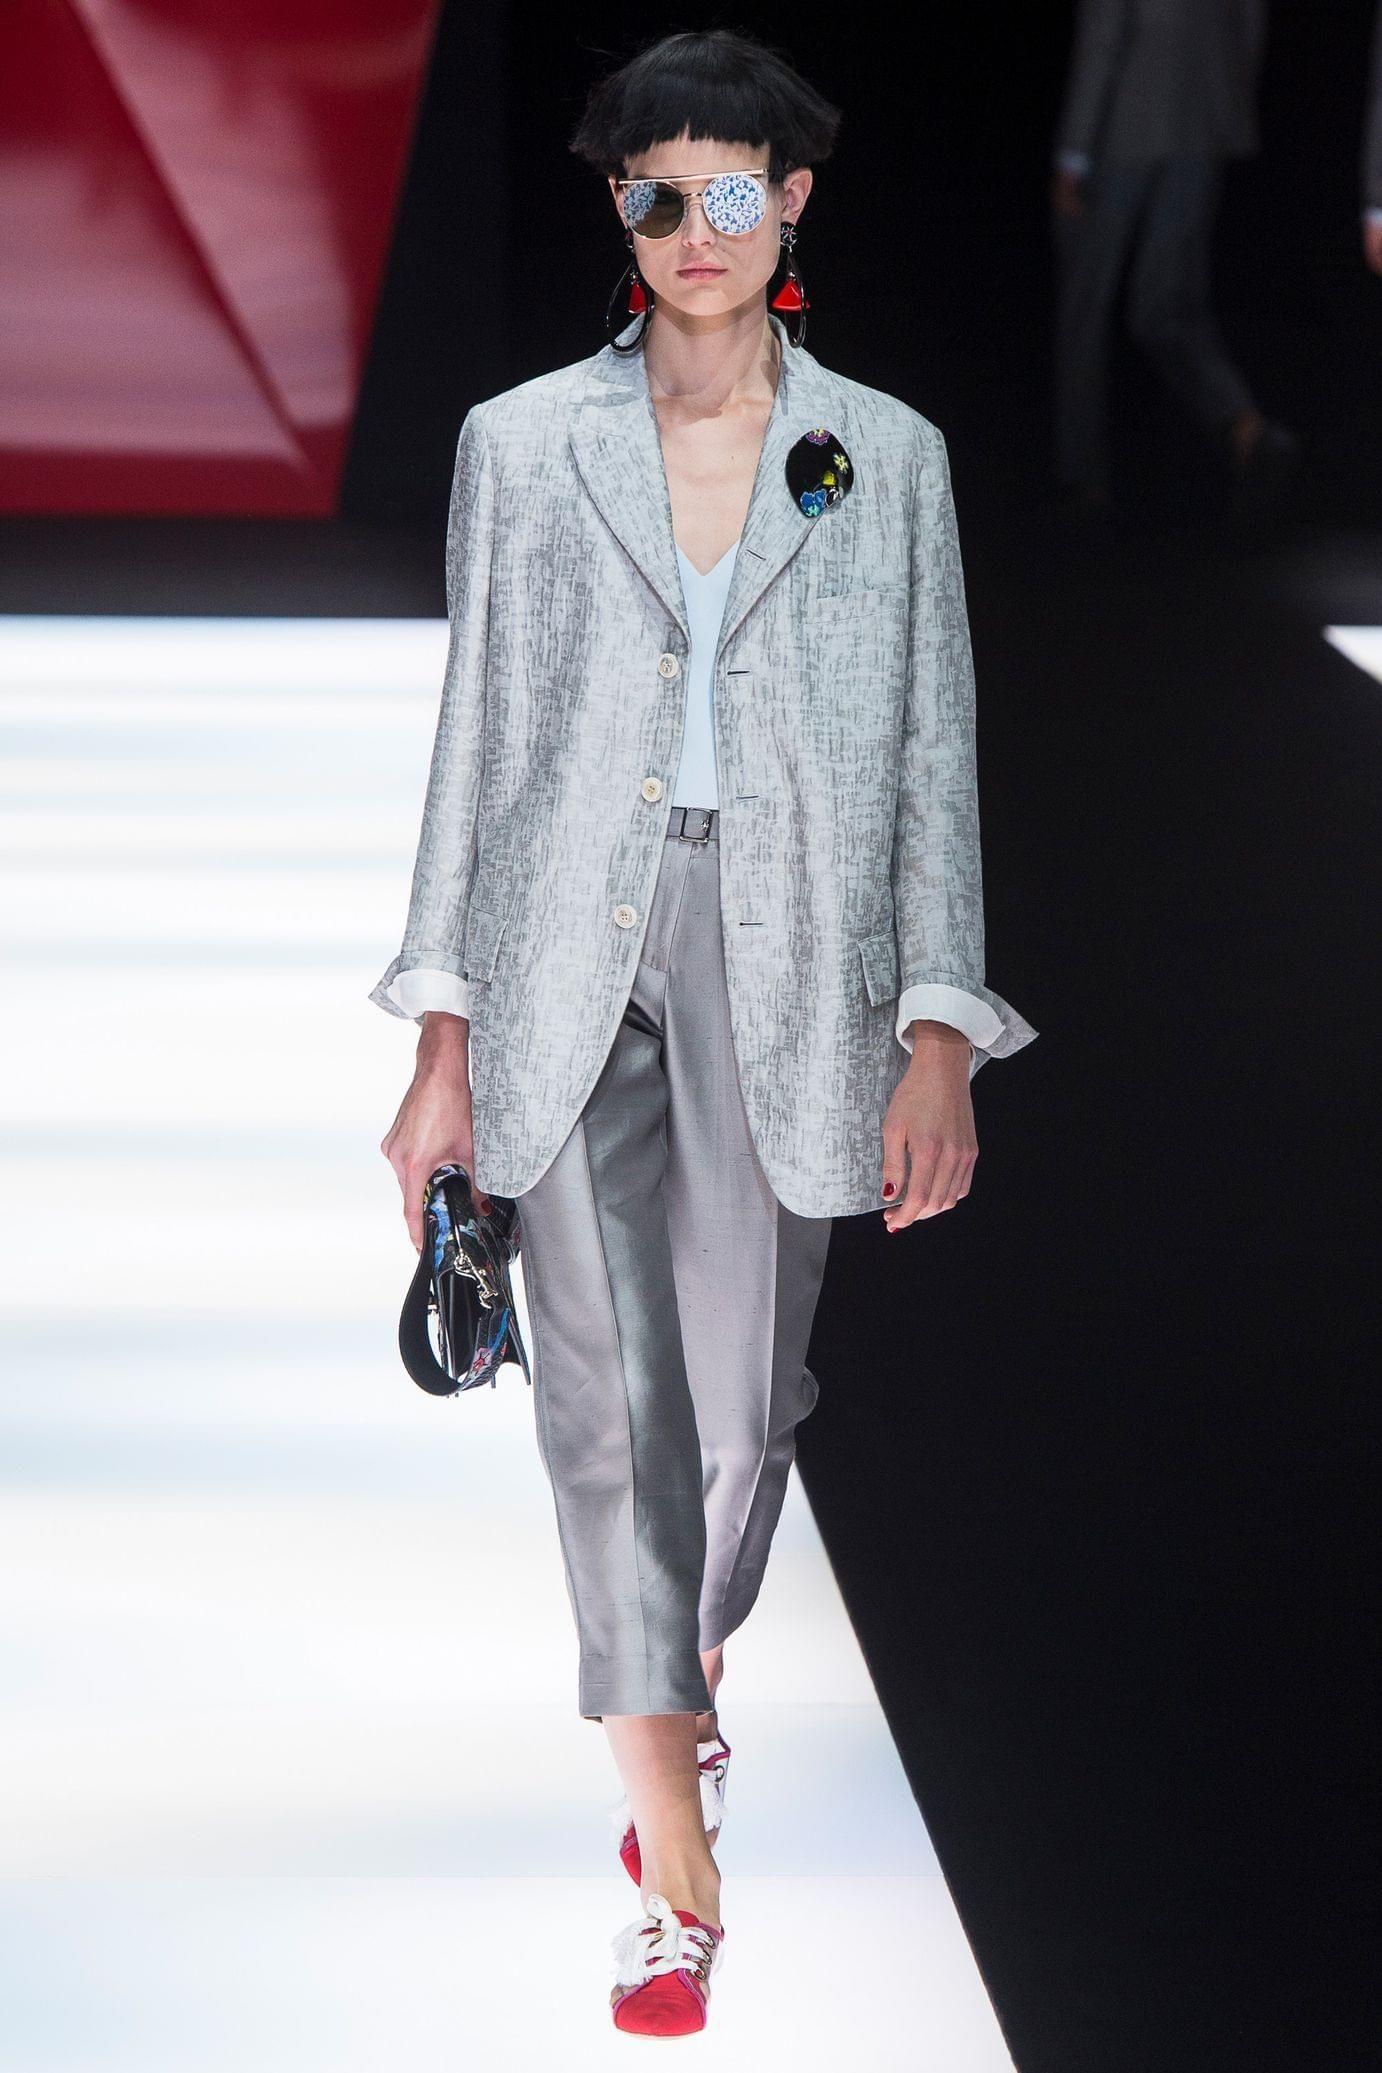 Giorgio Armani весна лето 2018 брючный костюм